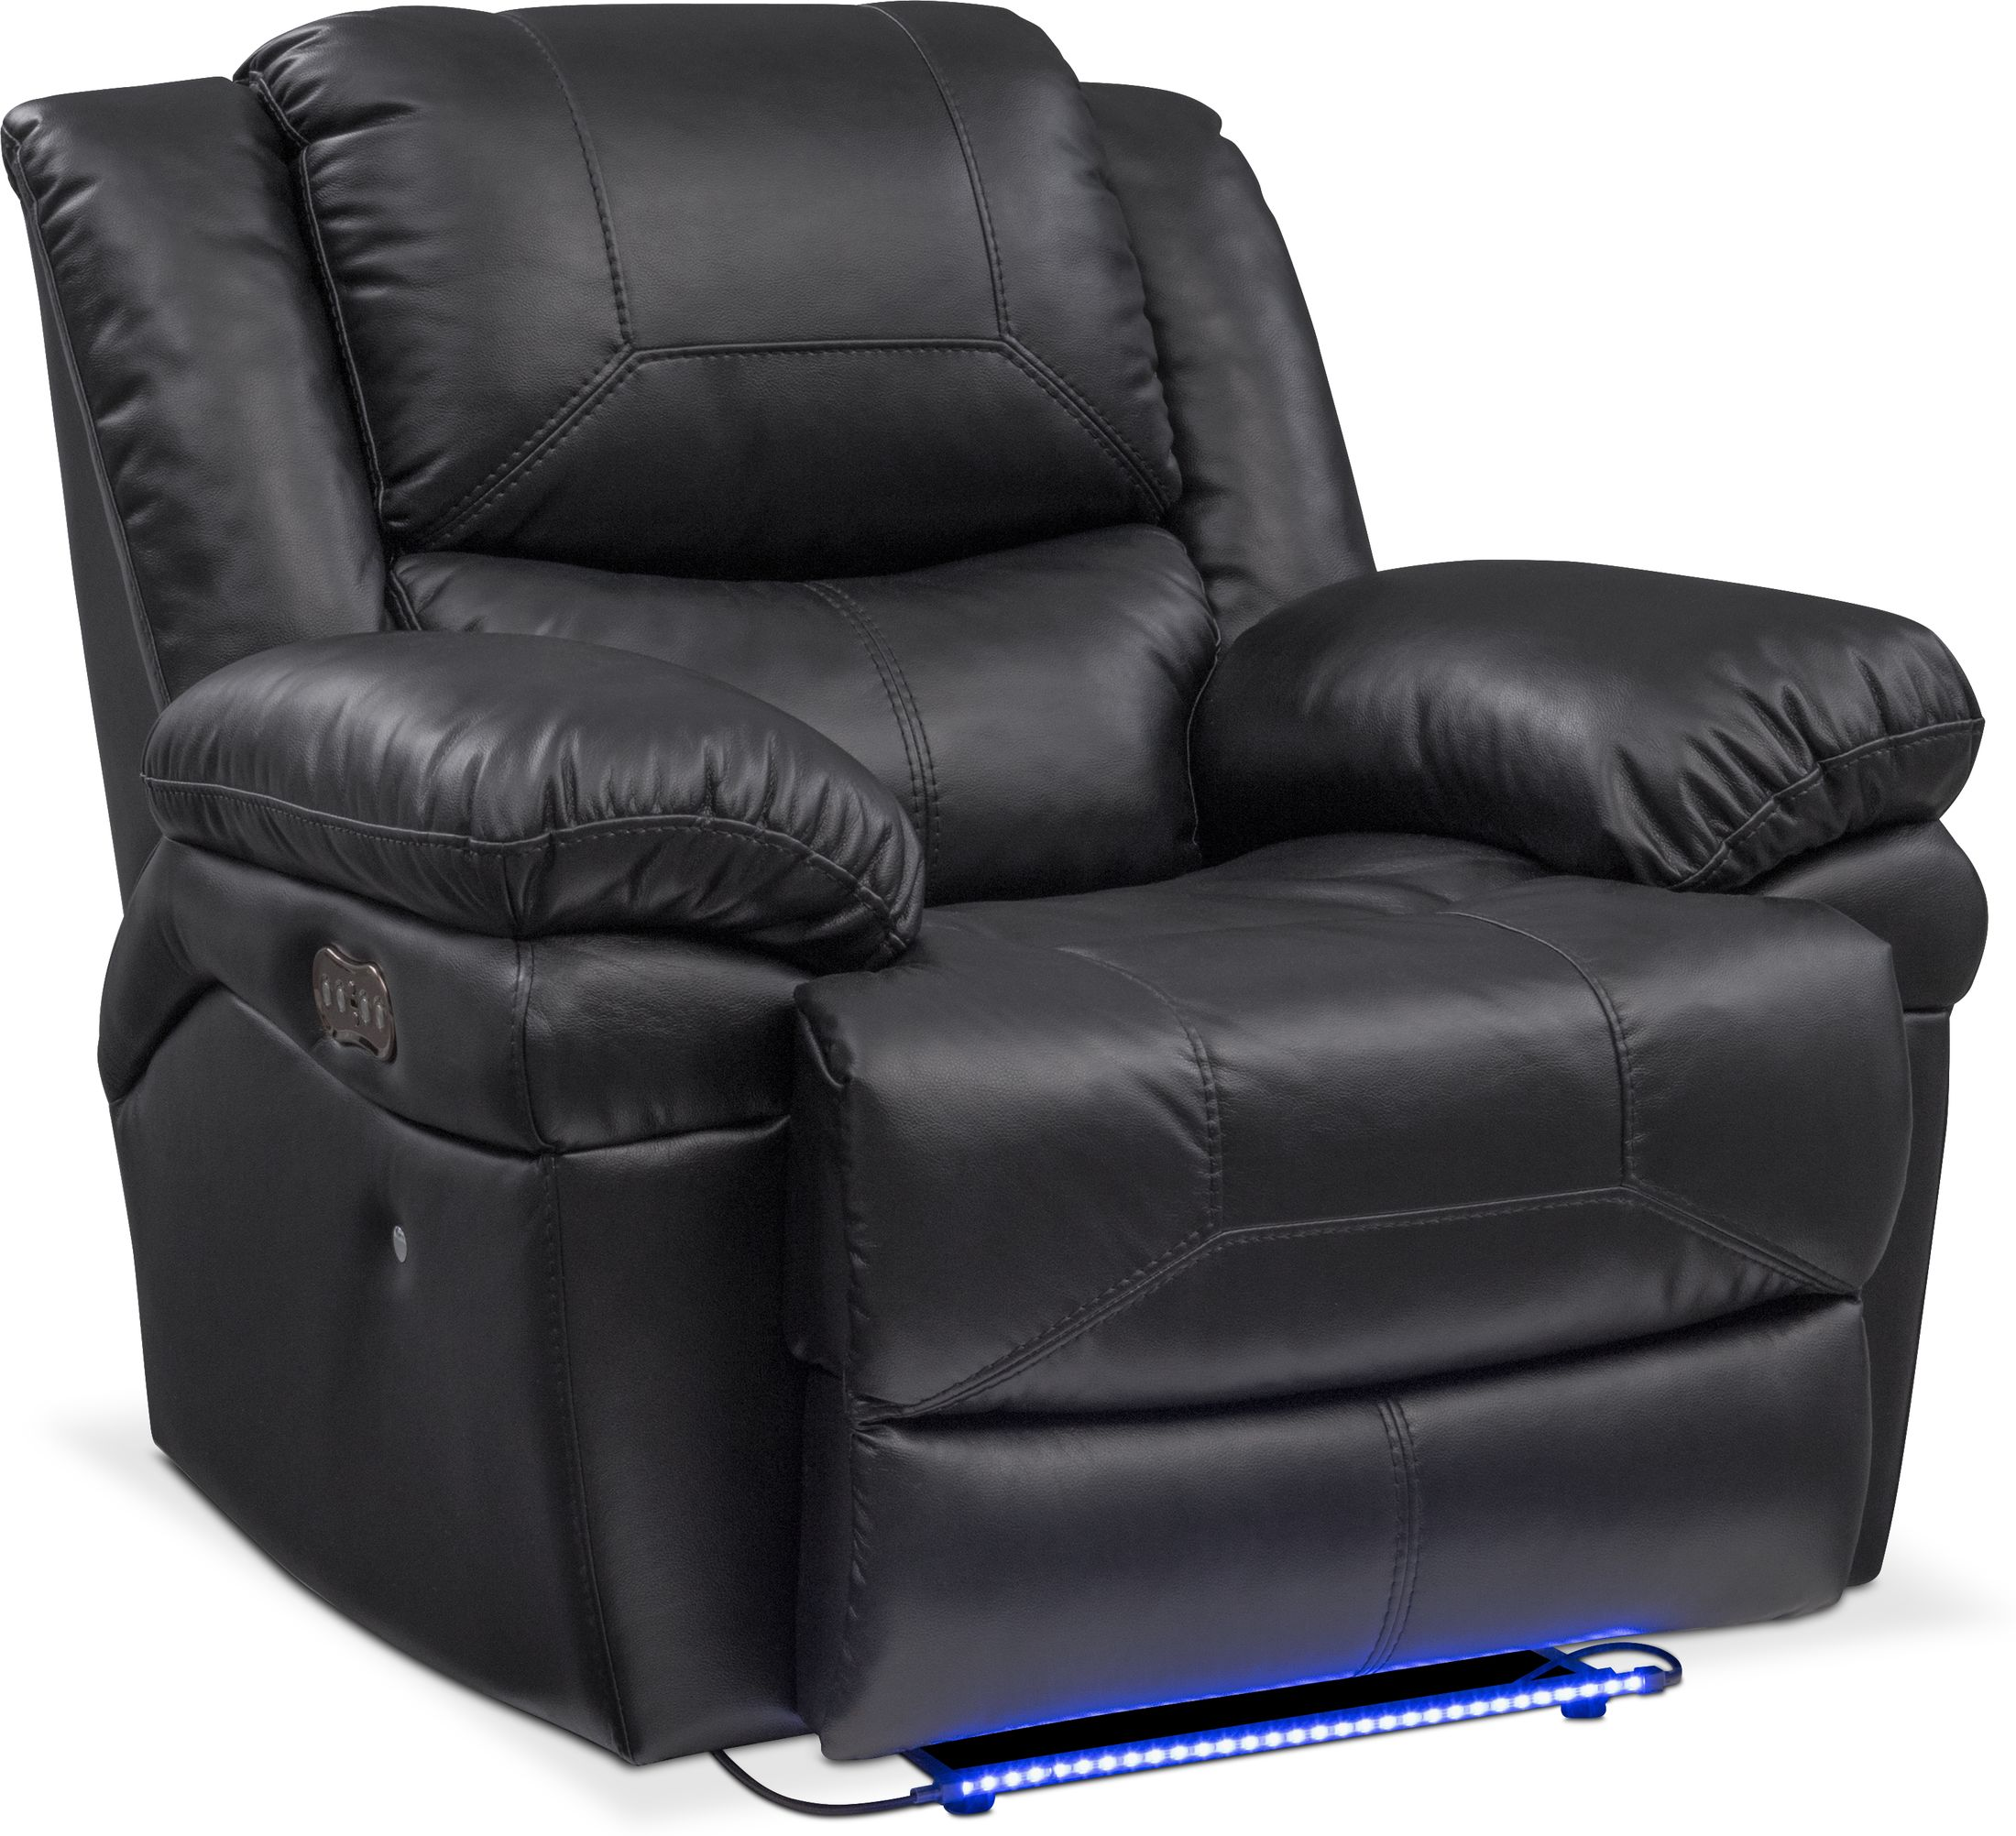 Living Room Furniture - Monza Dual-Power Recliner